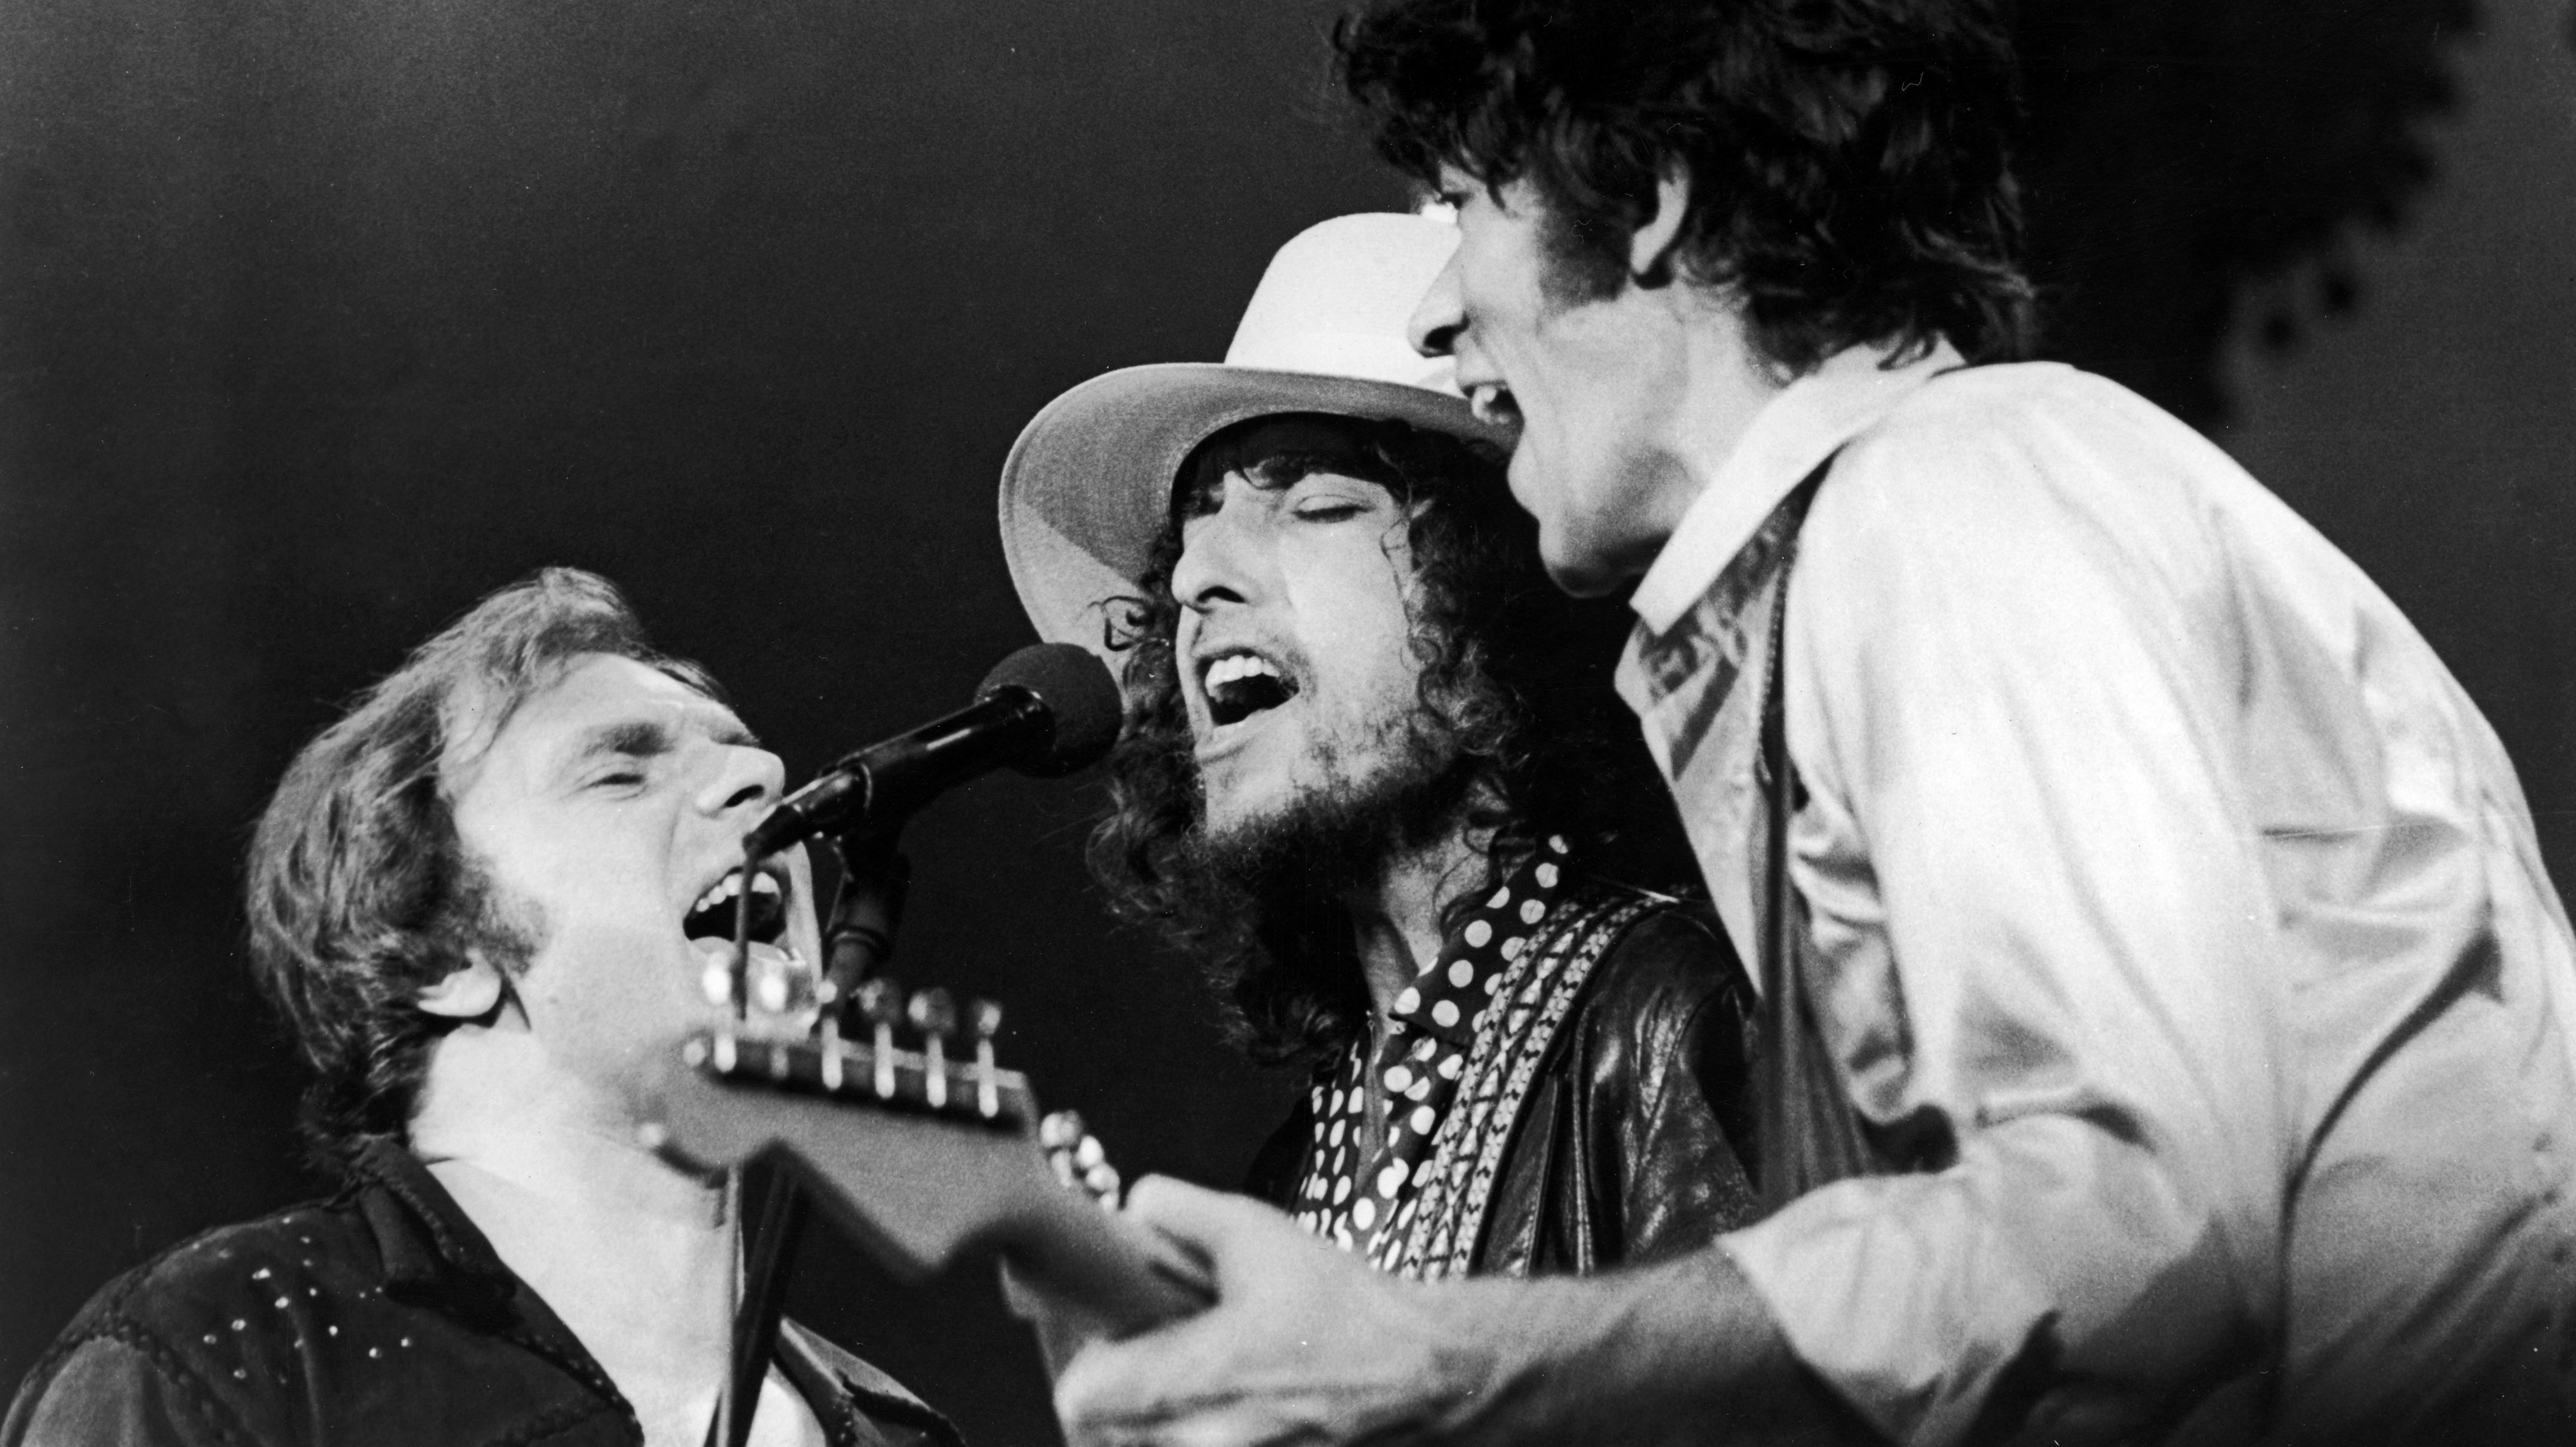 Do We Really Need Bob Dylan And Van Morrison Box Sets